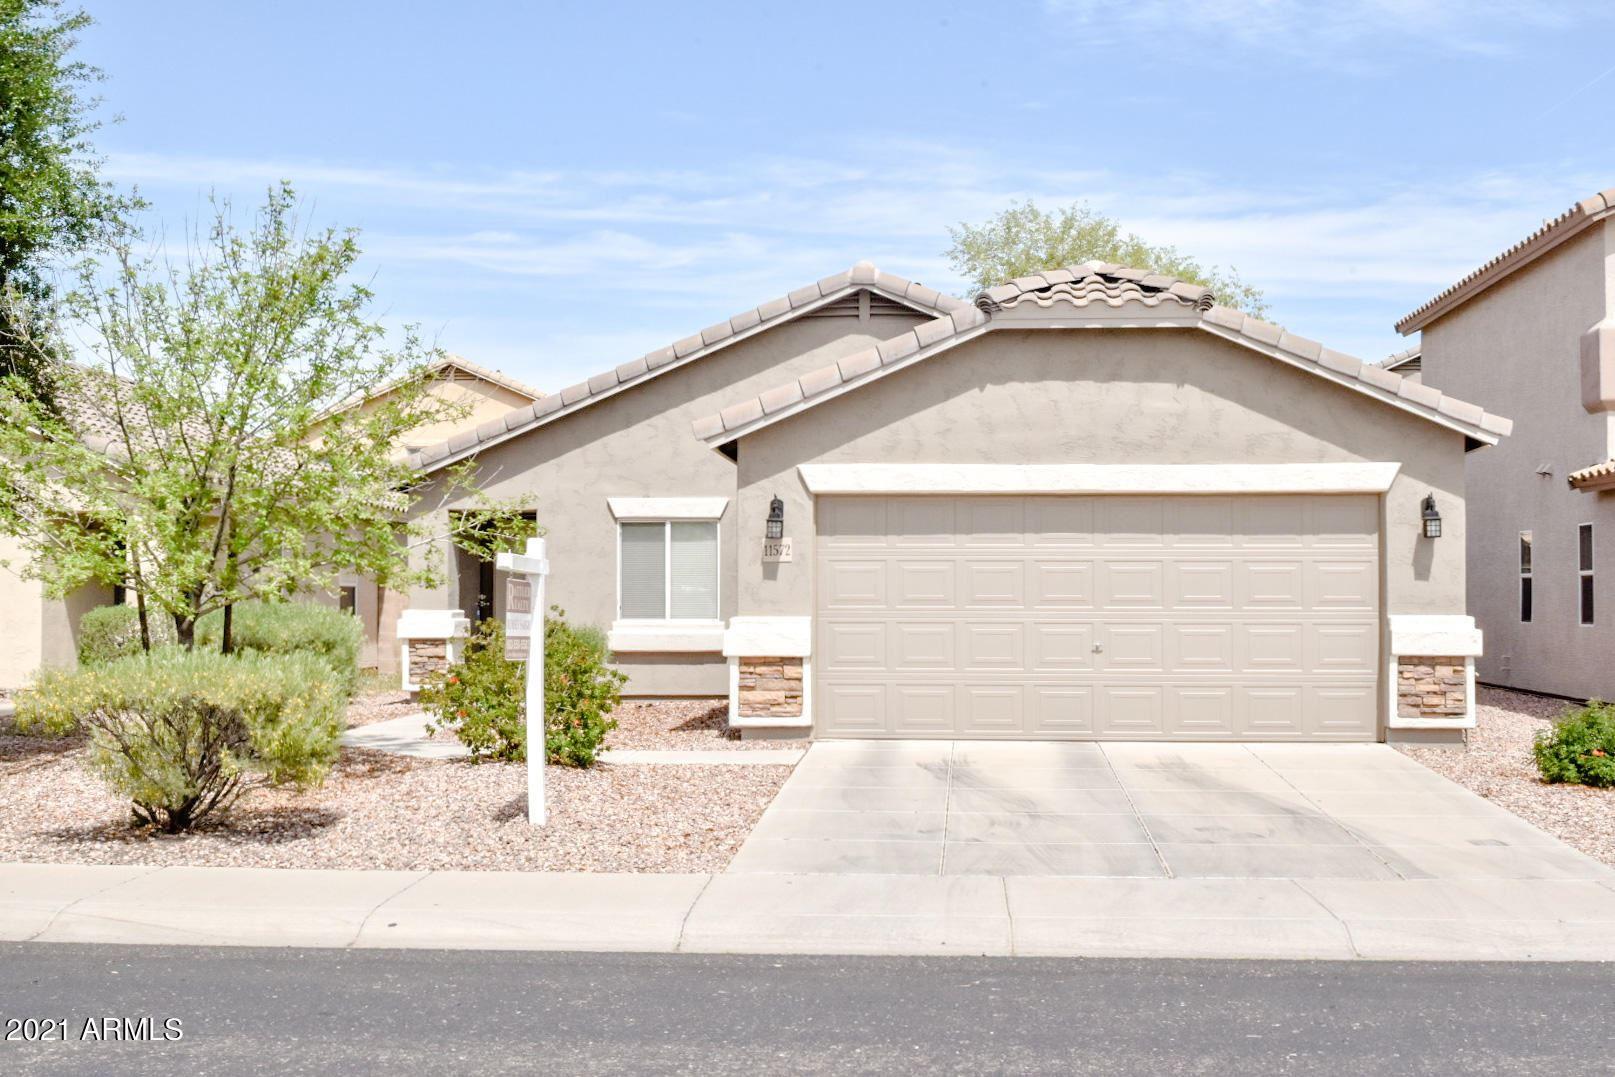 Photo of 11572 W CAROL Avenue, Youngtown, AZ 85363 (MLS # 6215228)